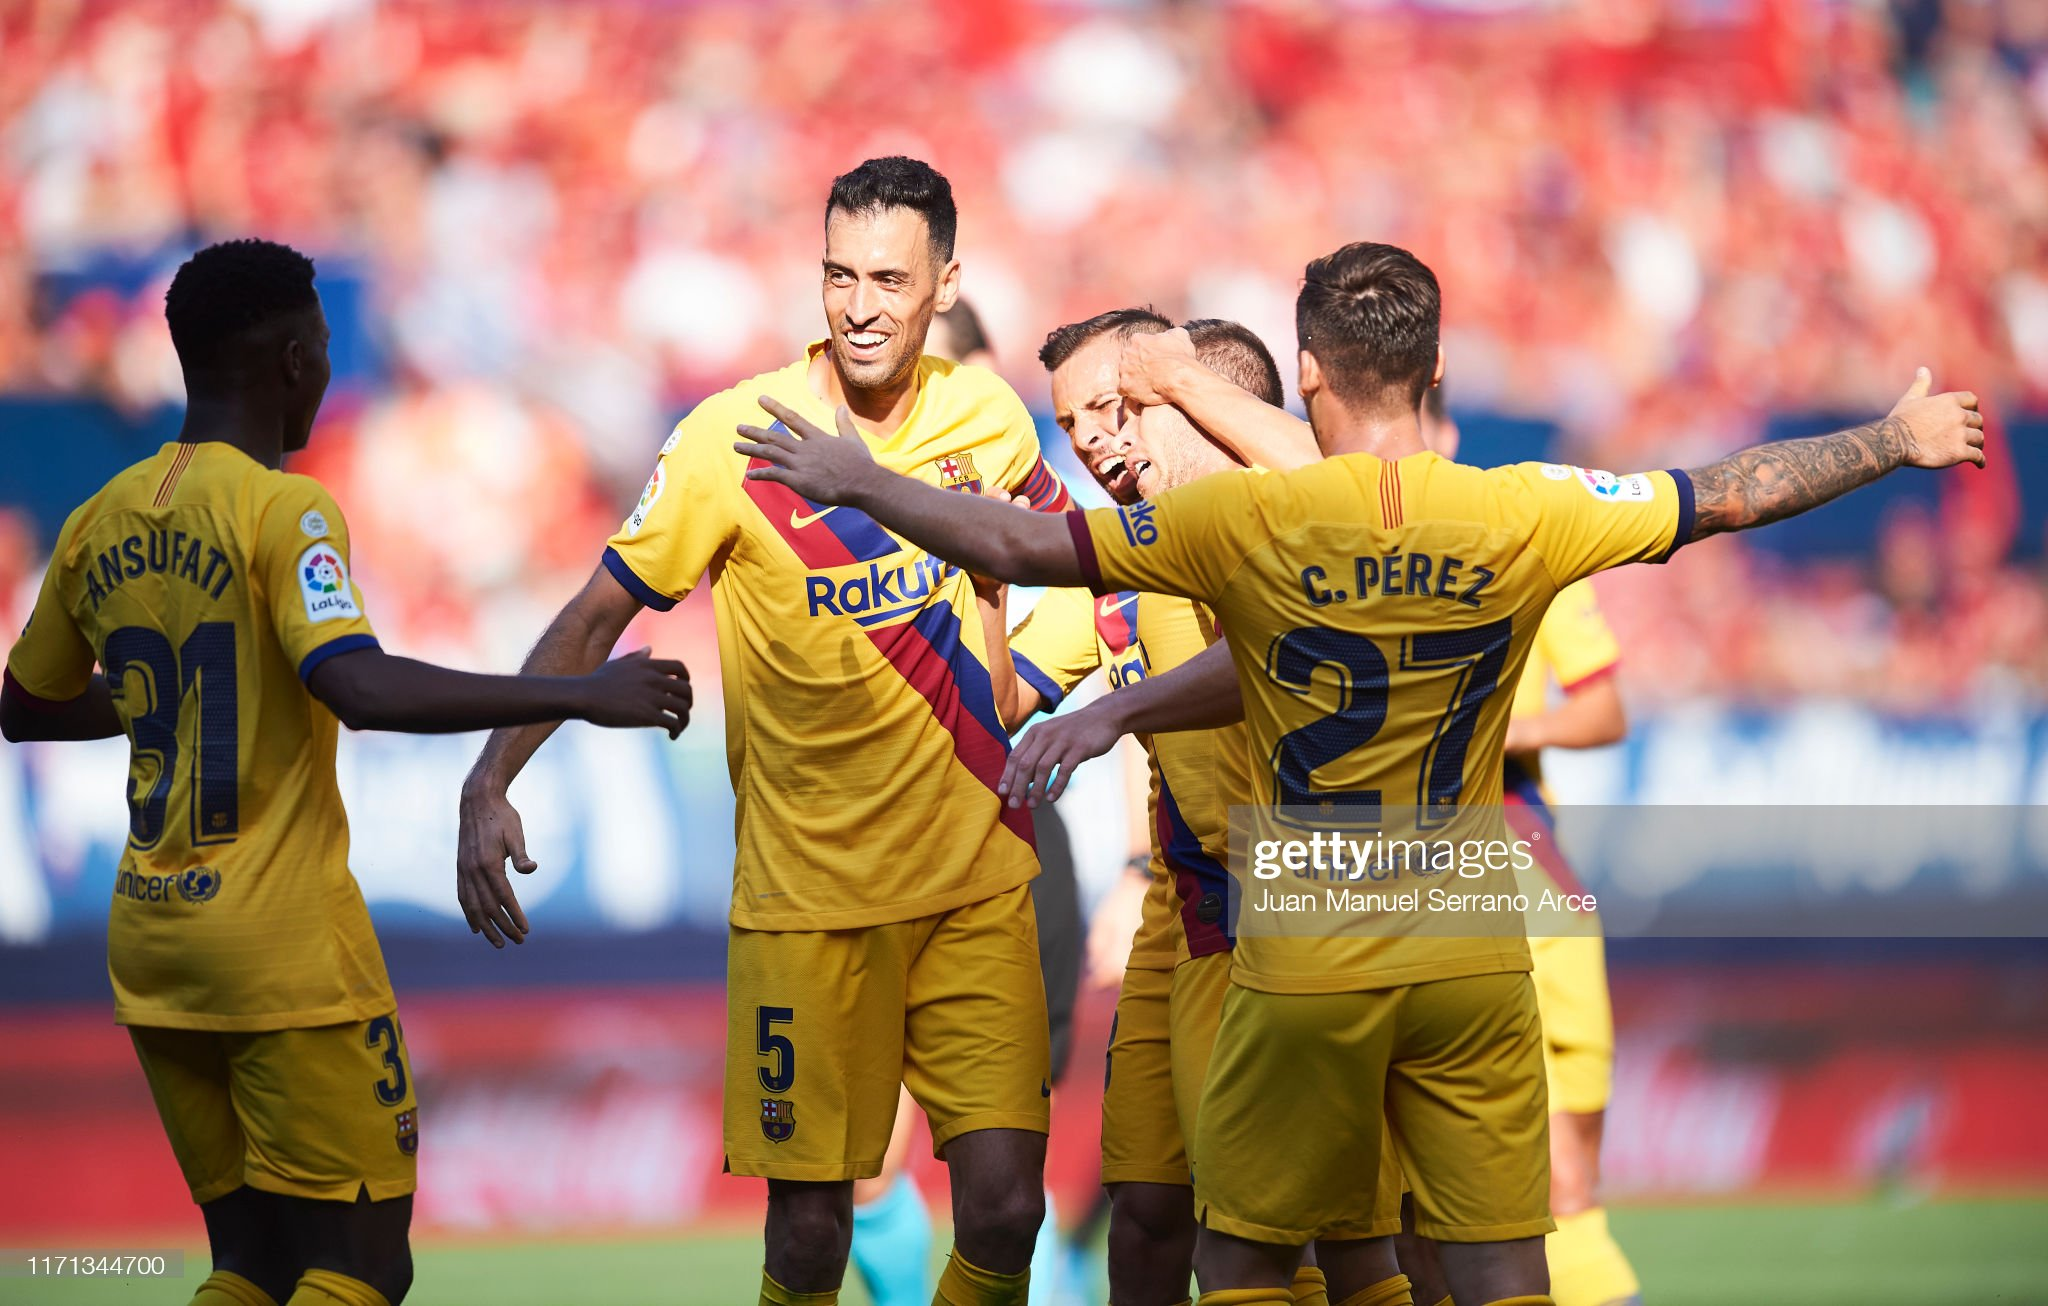 صور مباراة : أوساسونا - برشلونة 2-2 ( 31-08-2019 )  Arthur-melo-of-fc-barcelona-celebrates-with-teammates-after-scoring-picture-id1171344700?s=2048x2048